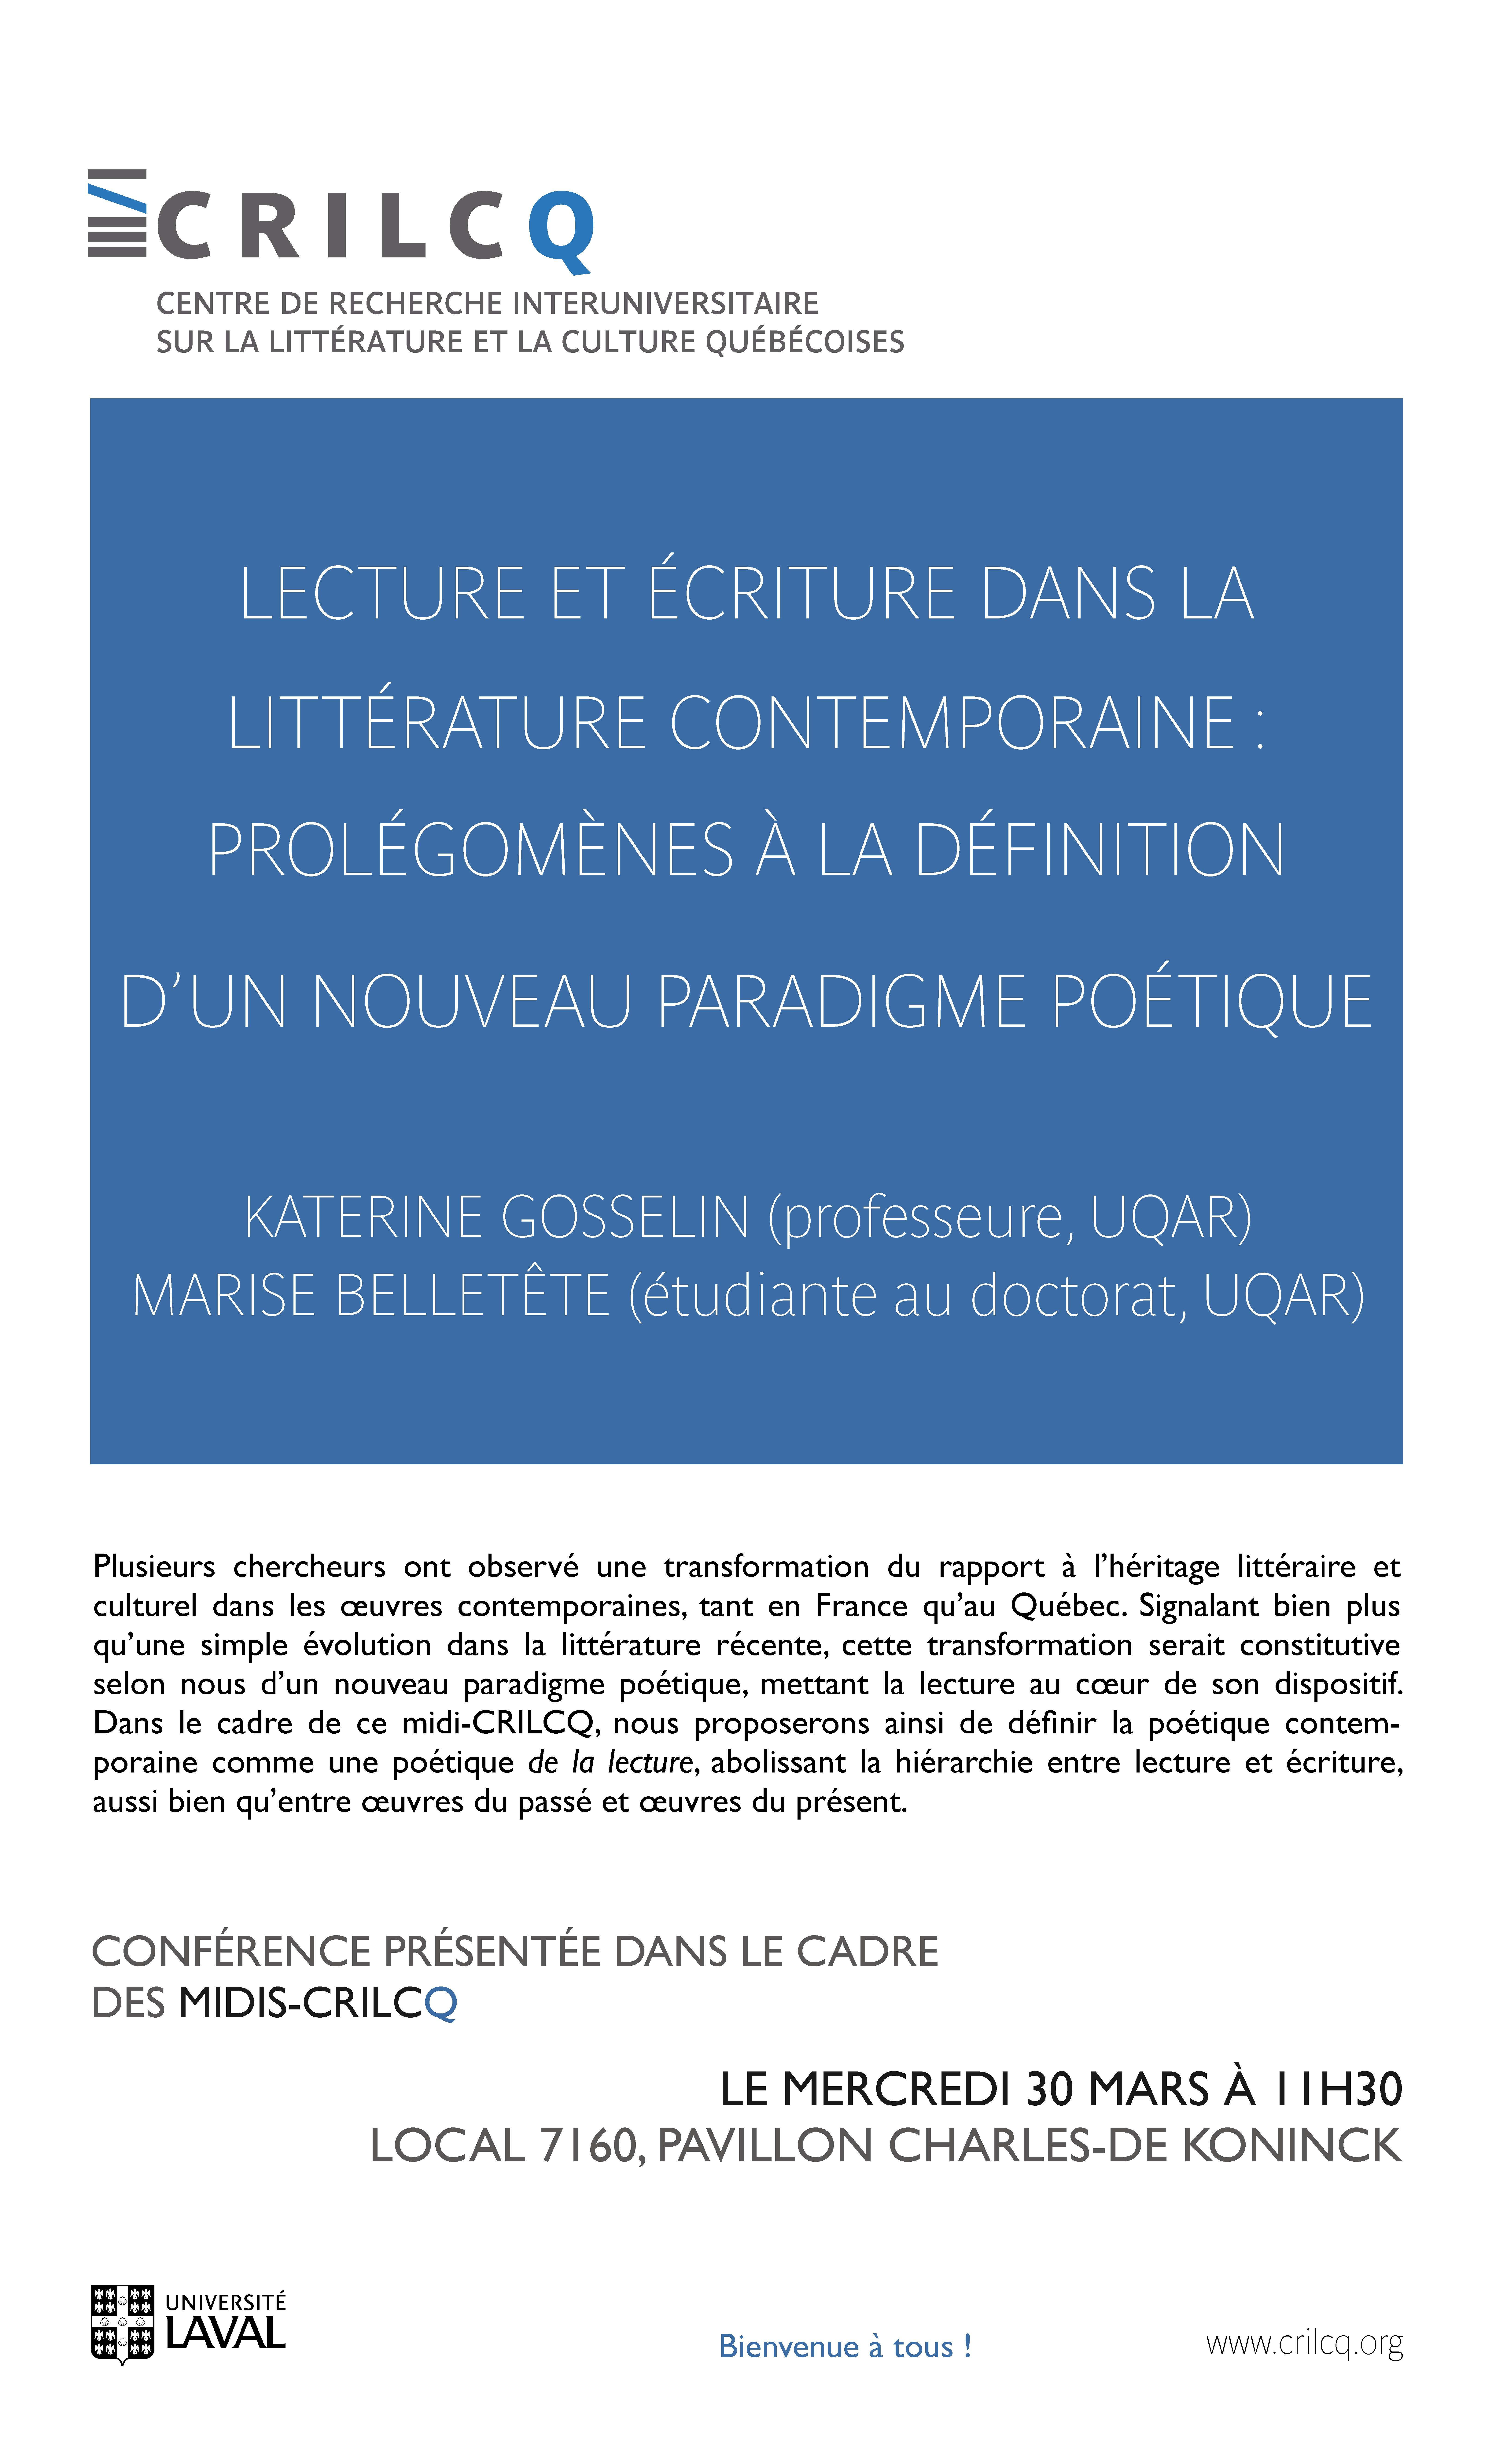 IMAGE-affiche-midi-CRILCQ-Katerine-Gosselin-et-Marise-Belletete